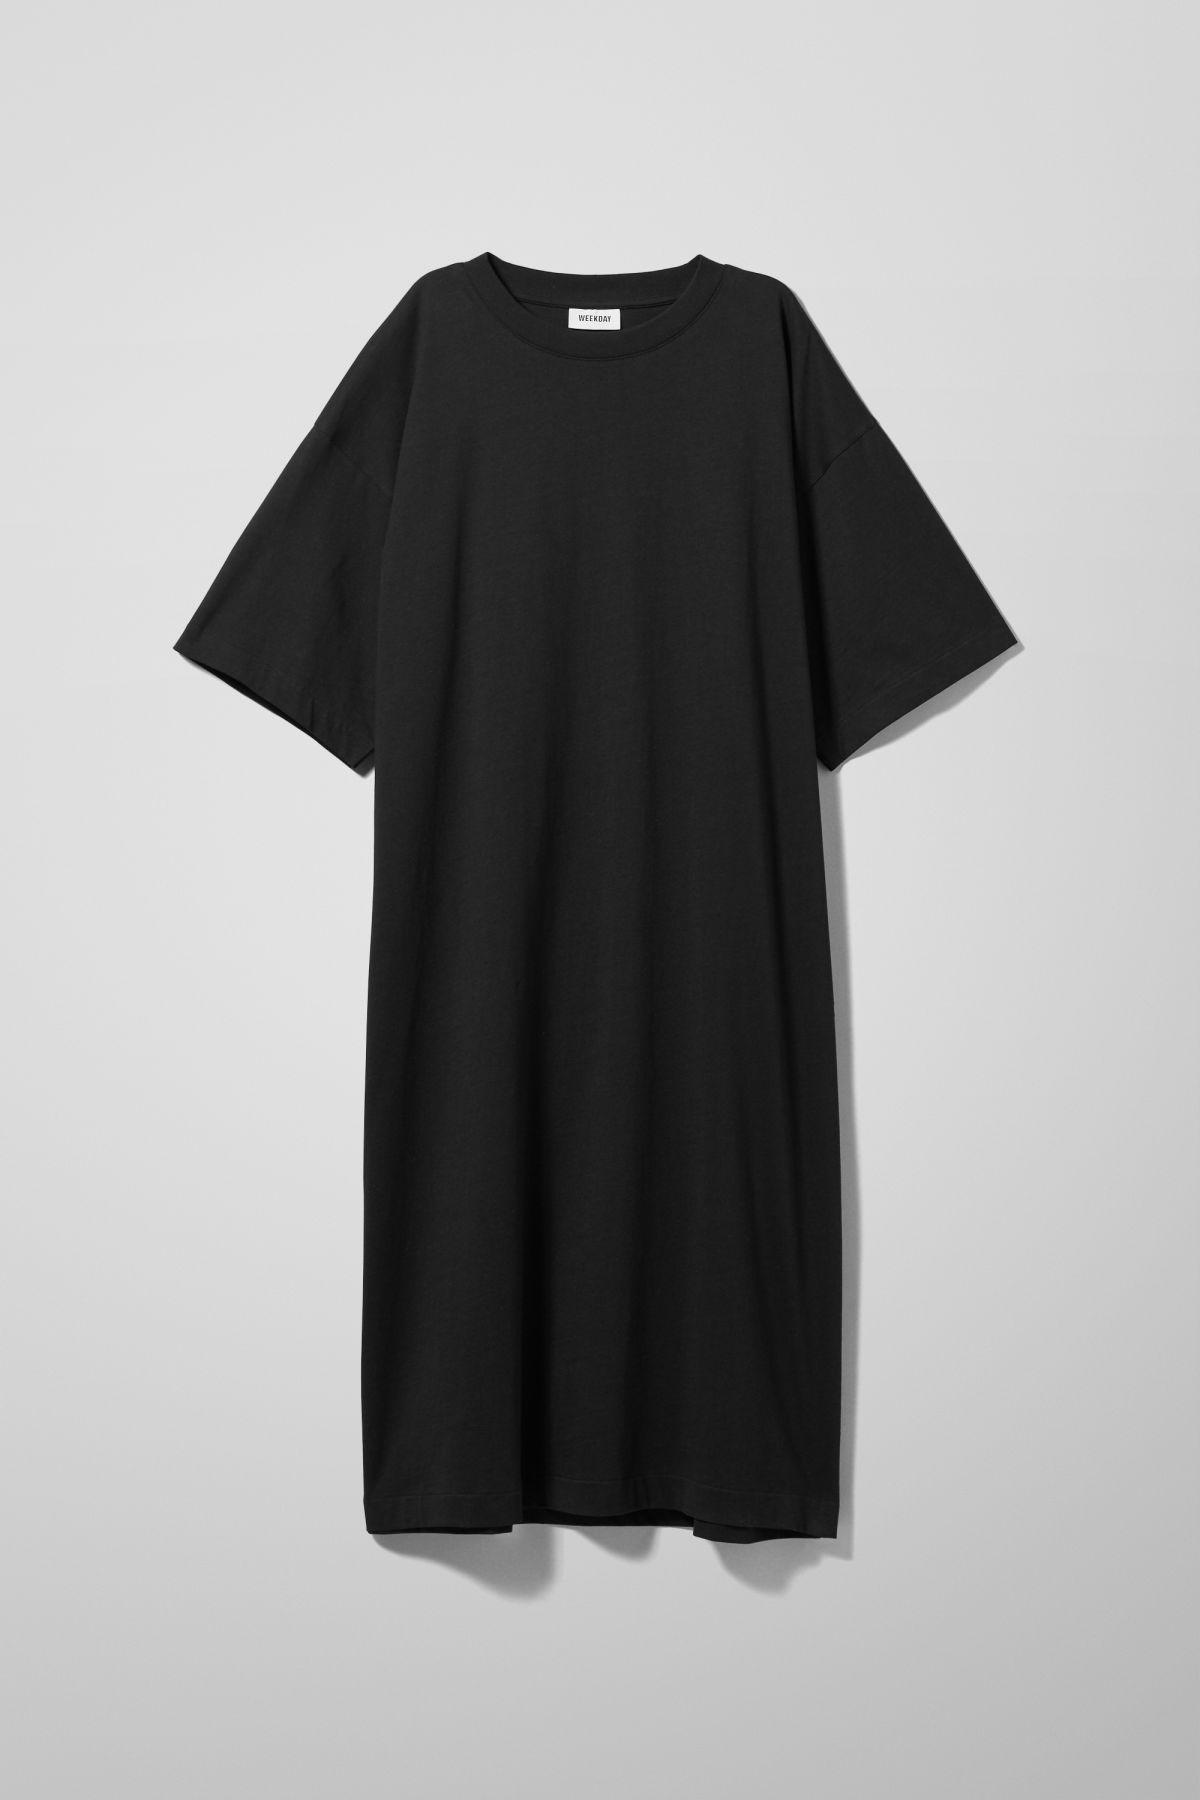 Image of Ines T-Shirt Dress - Black-XS